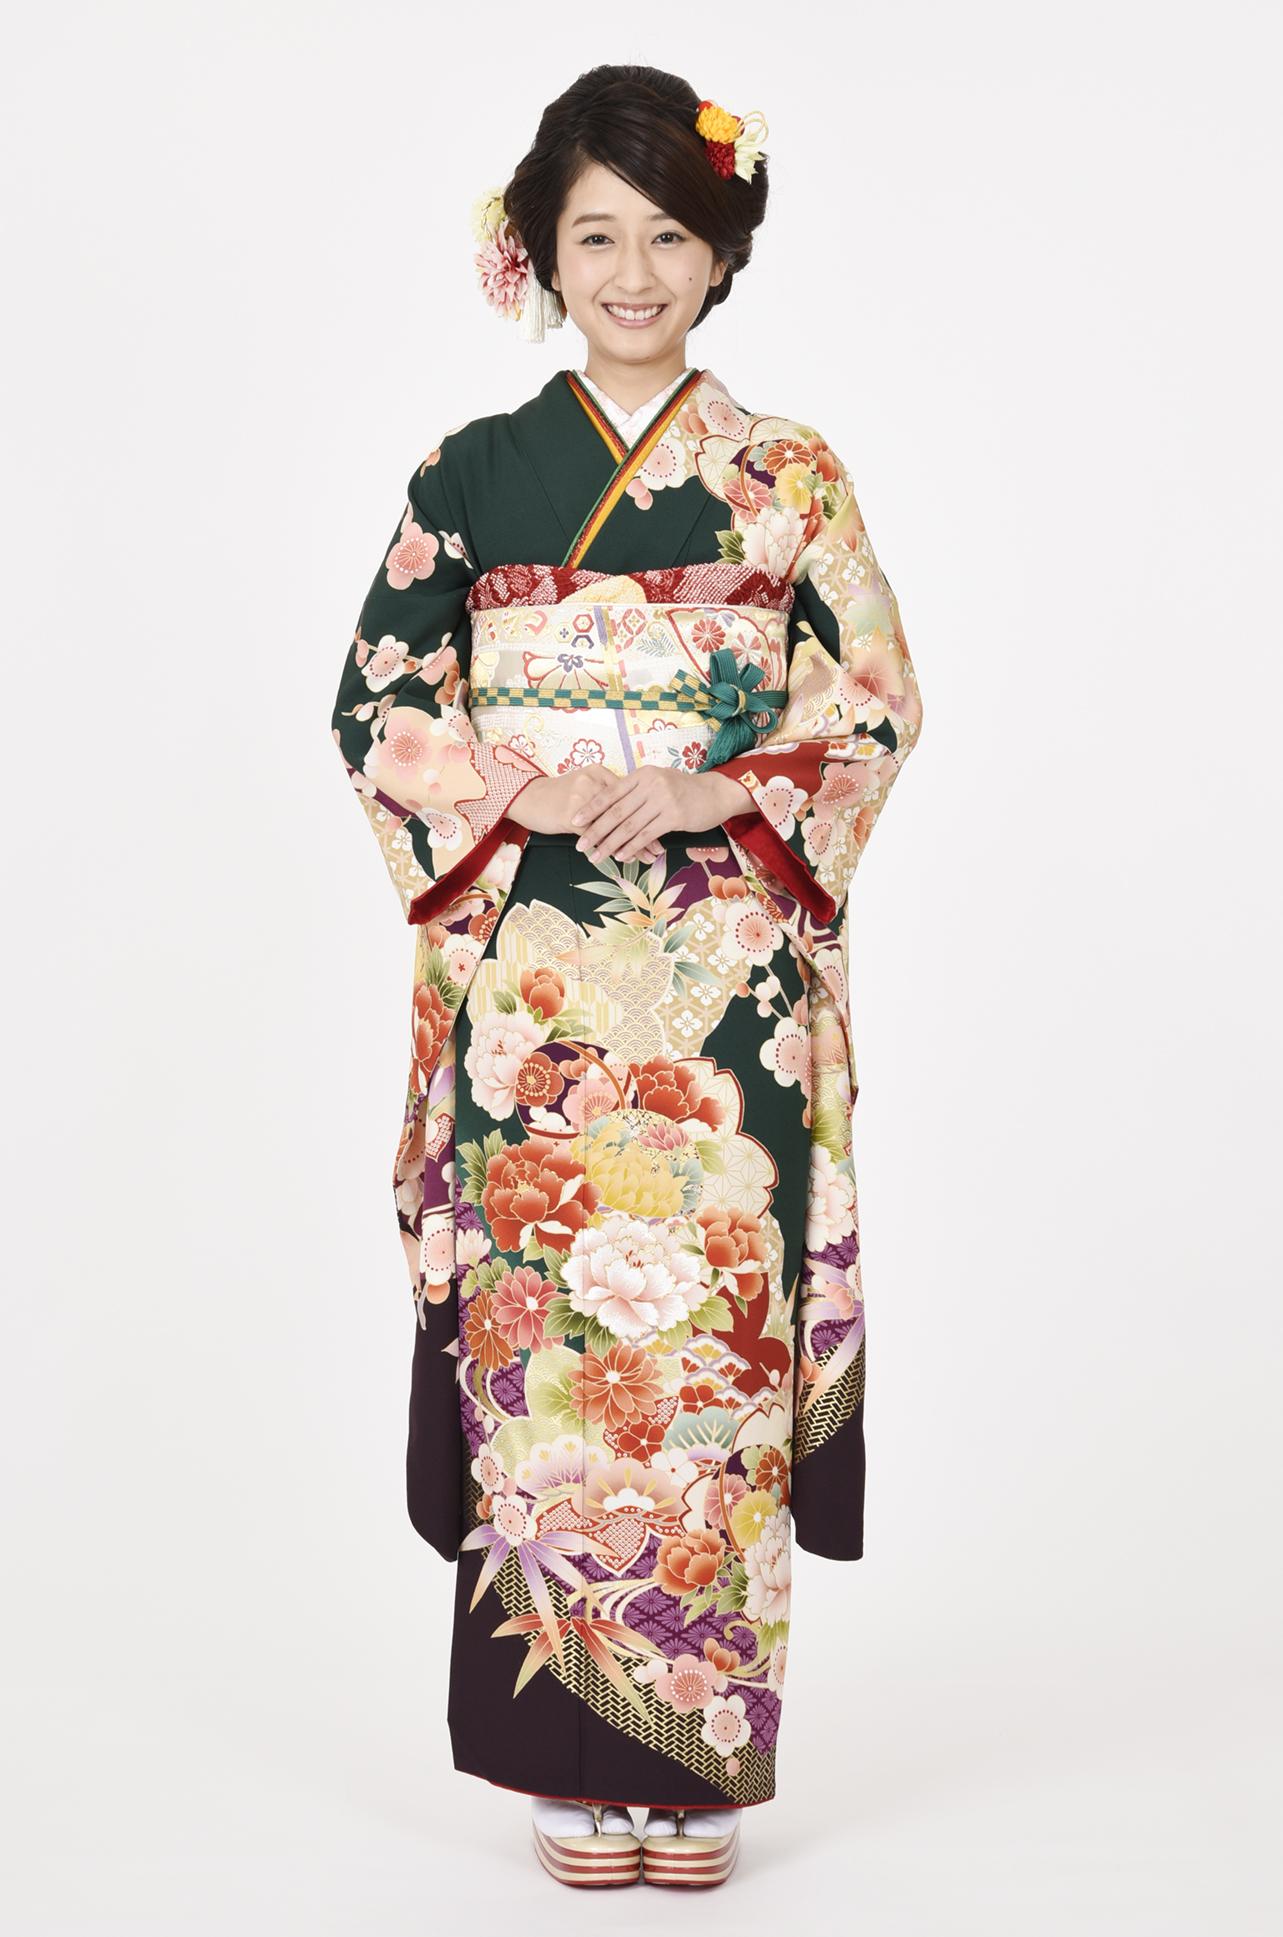 【MKK-2907】★深緑地に桜と牡丹のレトロ柄振袖